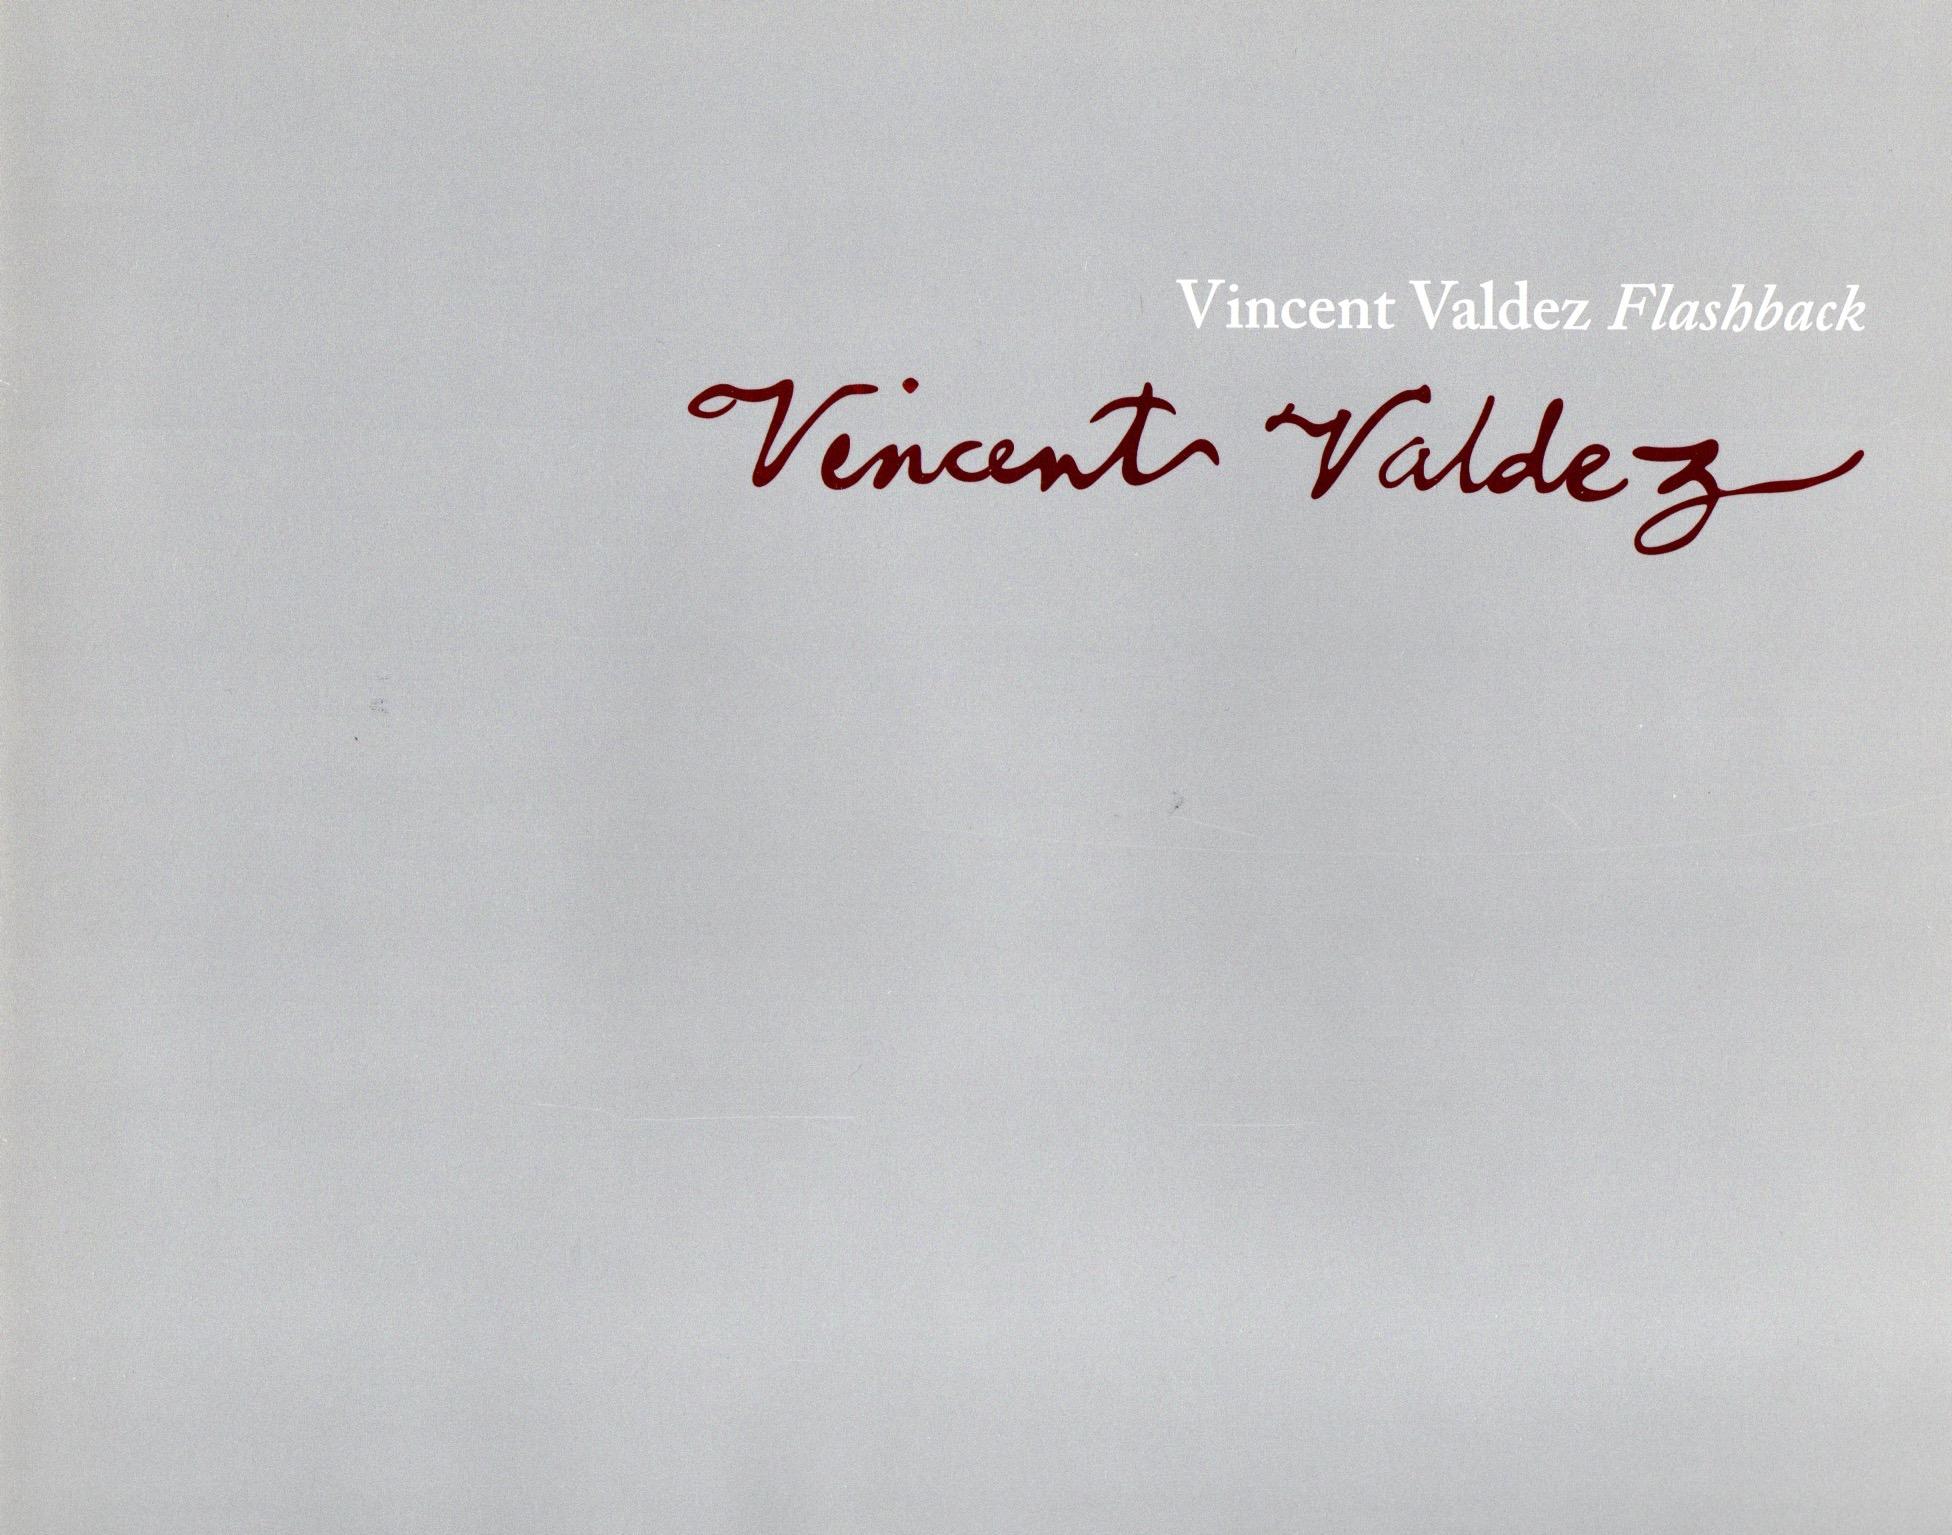 Vincent Valdez_Flashback_Southwest School of Art and Craft_San Antonio_2010